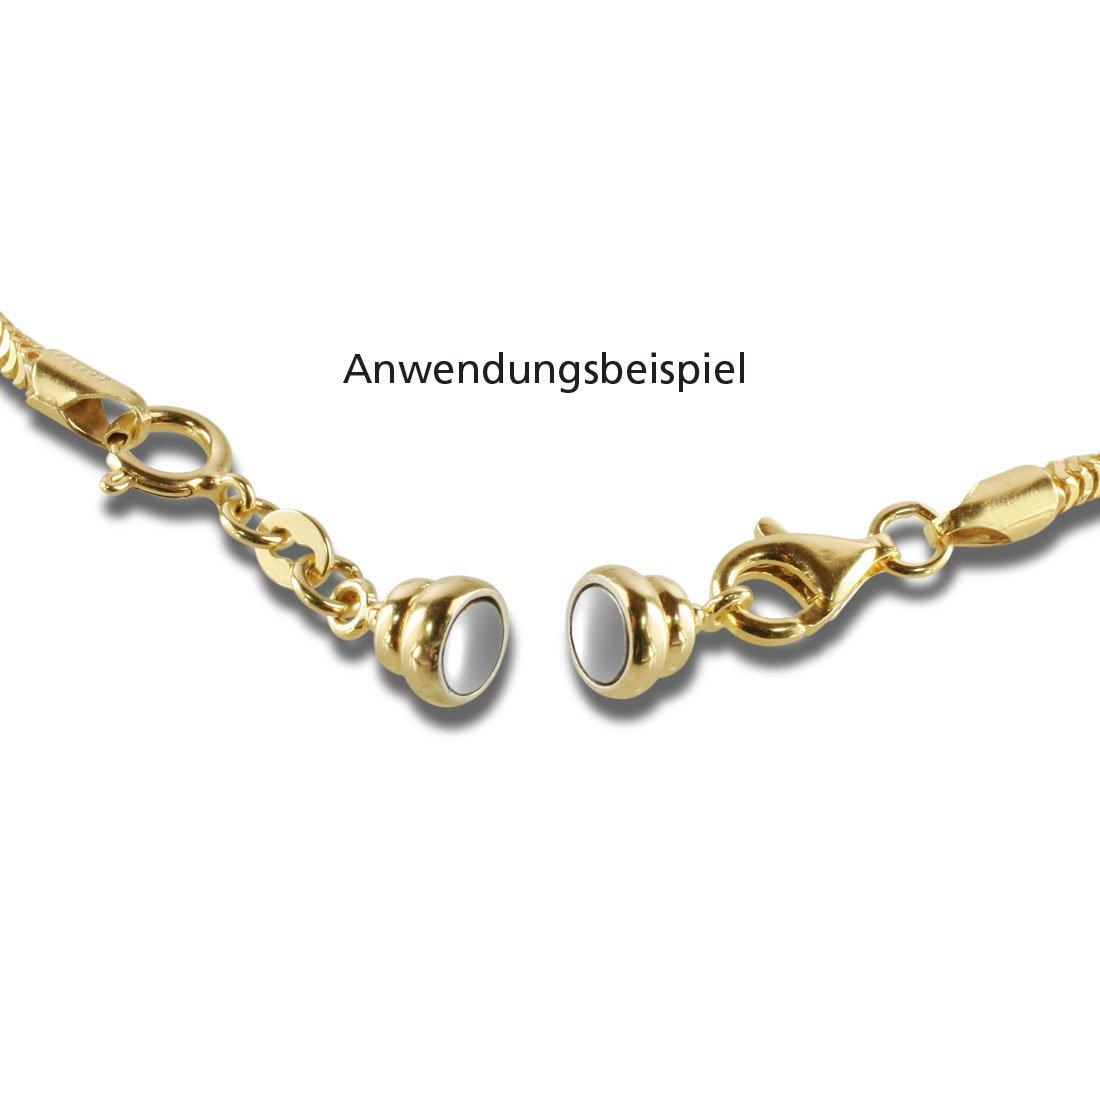 2er Magnetschlie/ßen Set hochglanzpoliert 925// Sterlingsilber rhodiniert//gelbvergoldet BoB C